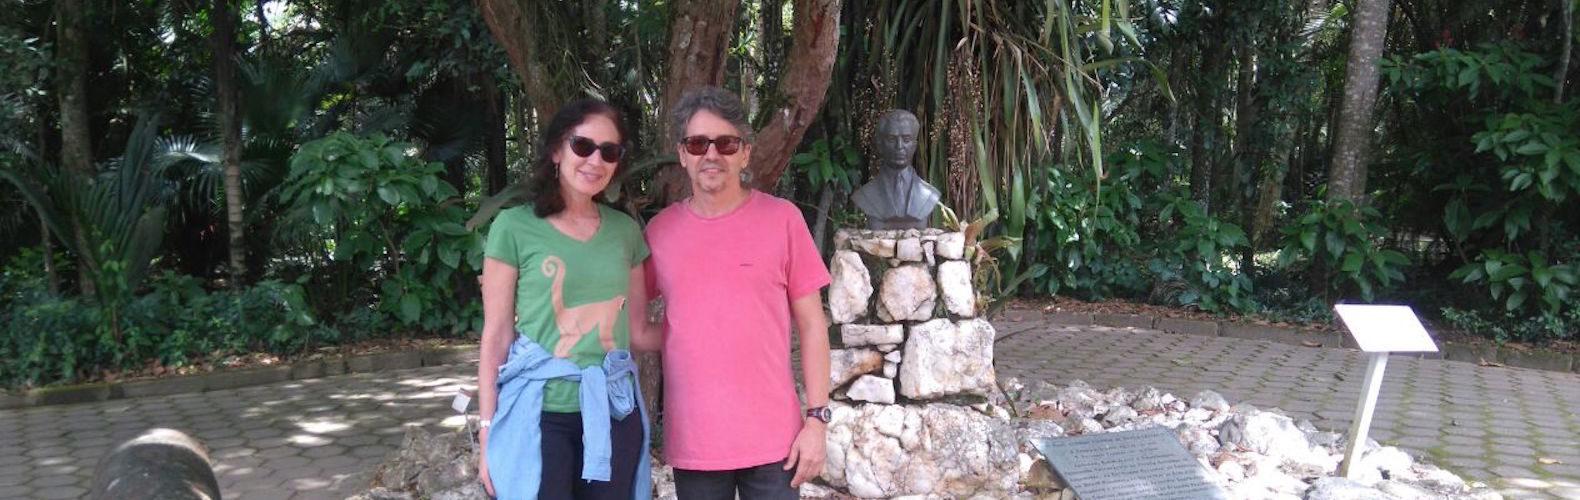 Dr Strier and Dr Mendes in Brazil